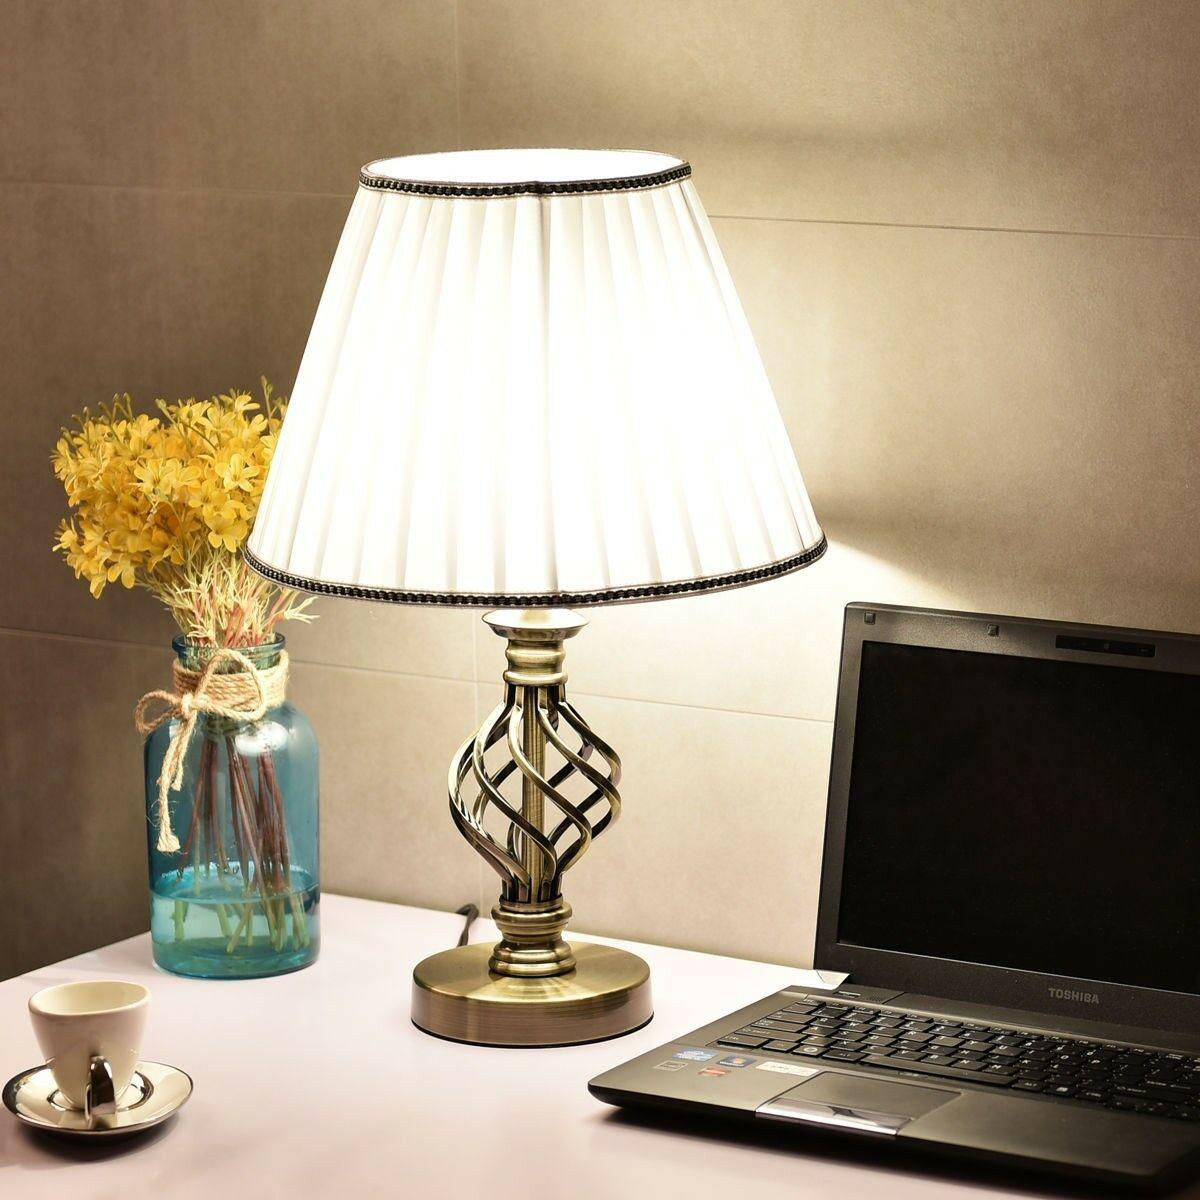 2pcs Home White Antique Brass Led Bulb Table Lamp Bedroom Nightstand Desk Light Bedside Table Lamps Table Lamp Bedside Table Brass